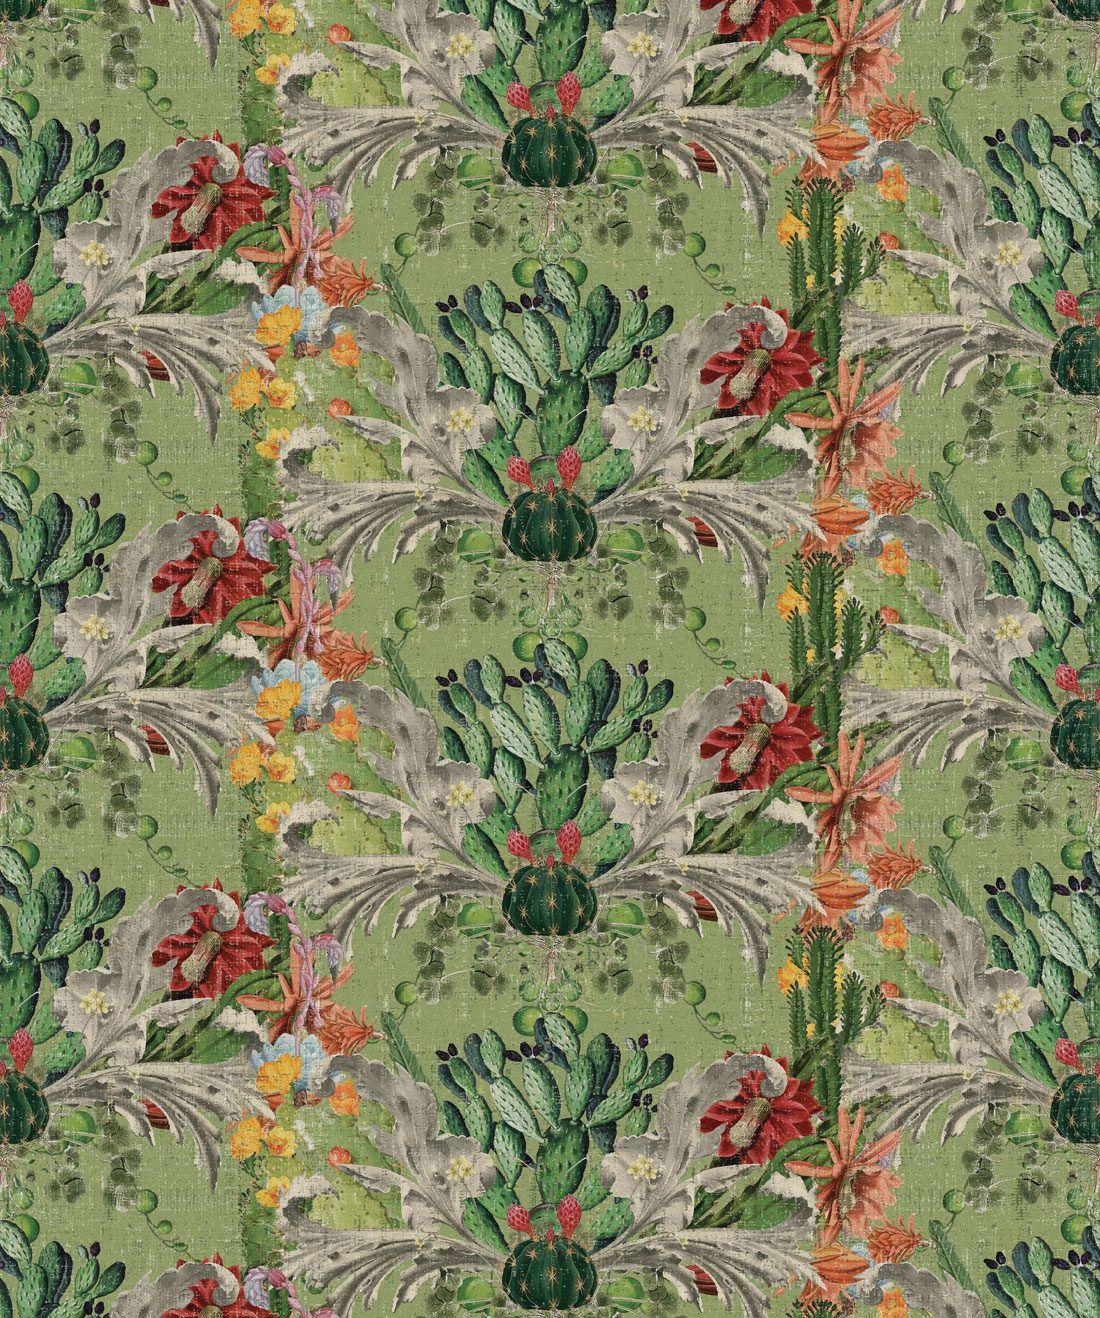 Cactus Wallpaper Verde